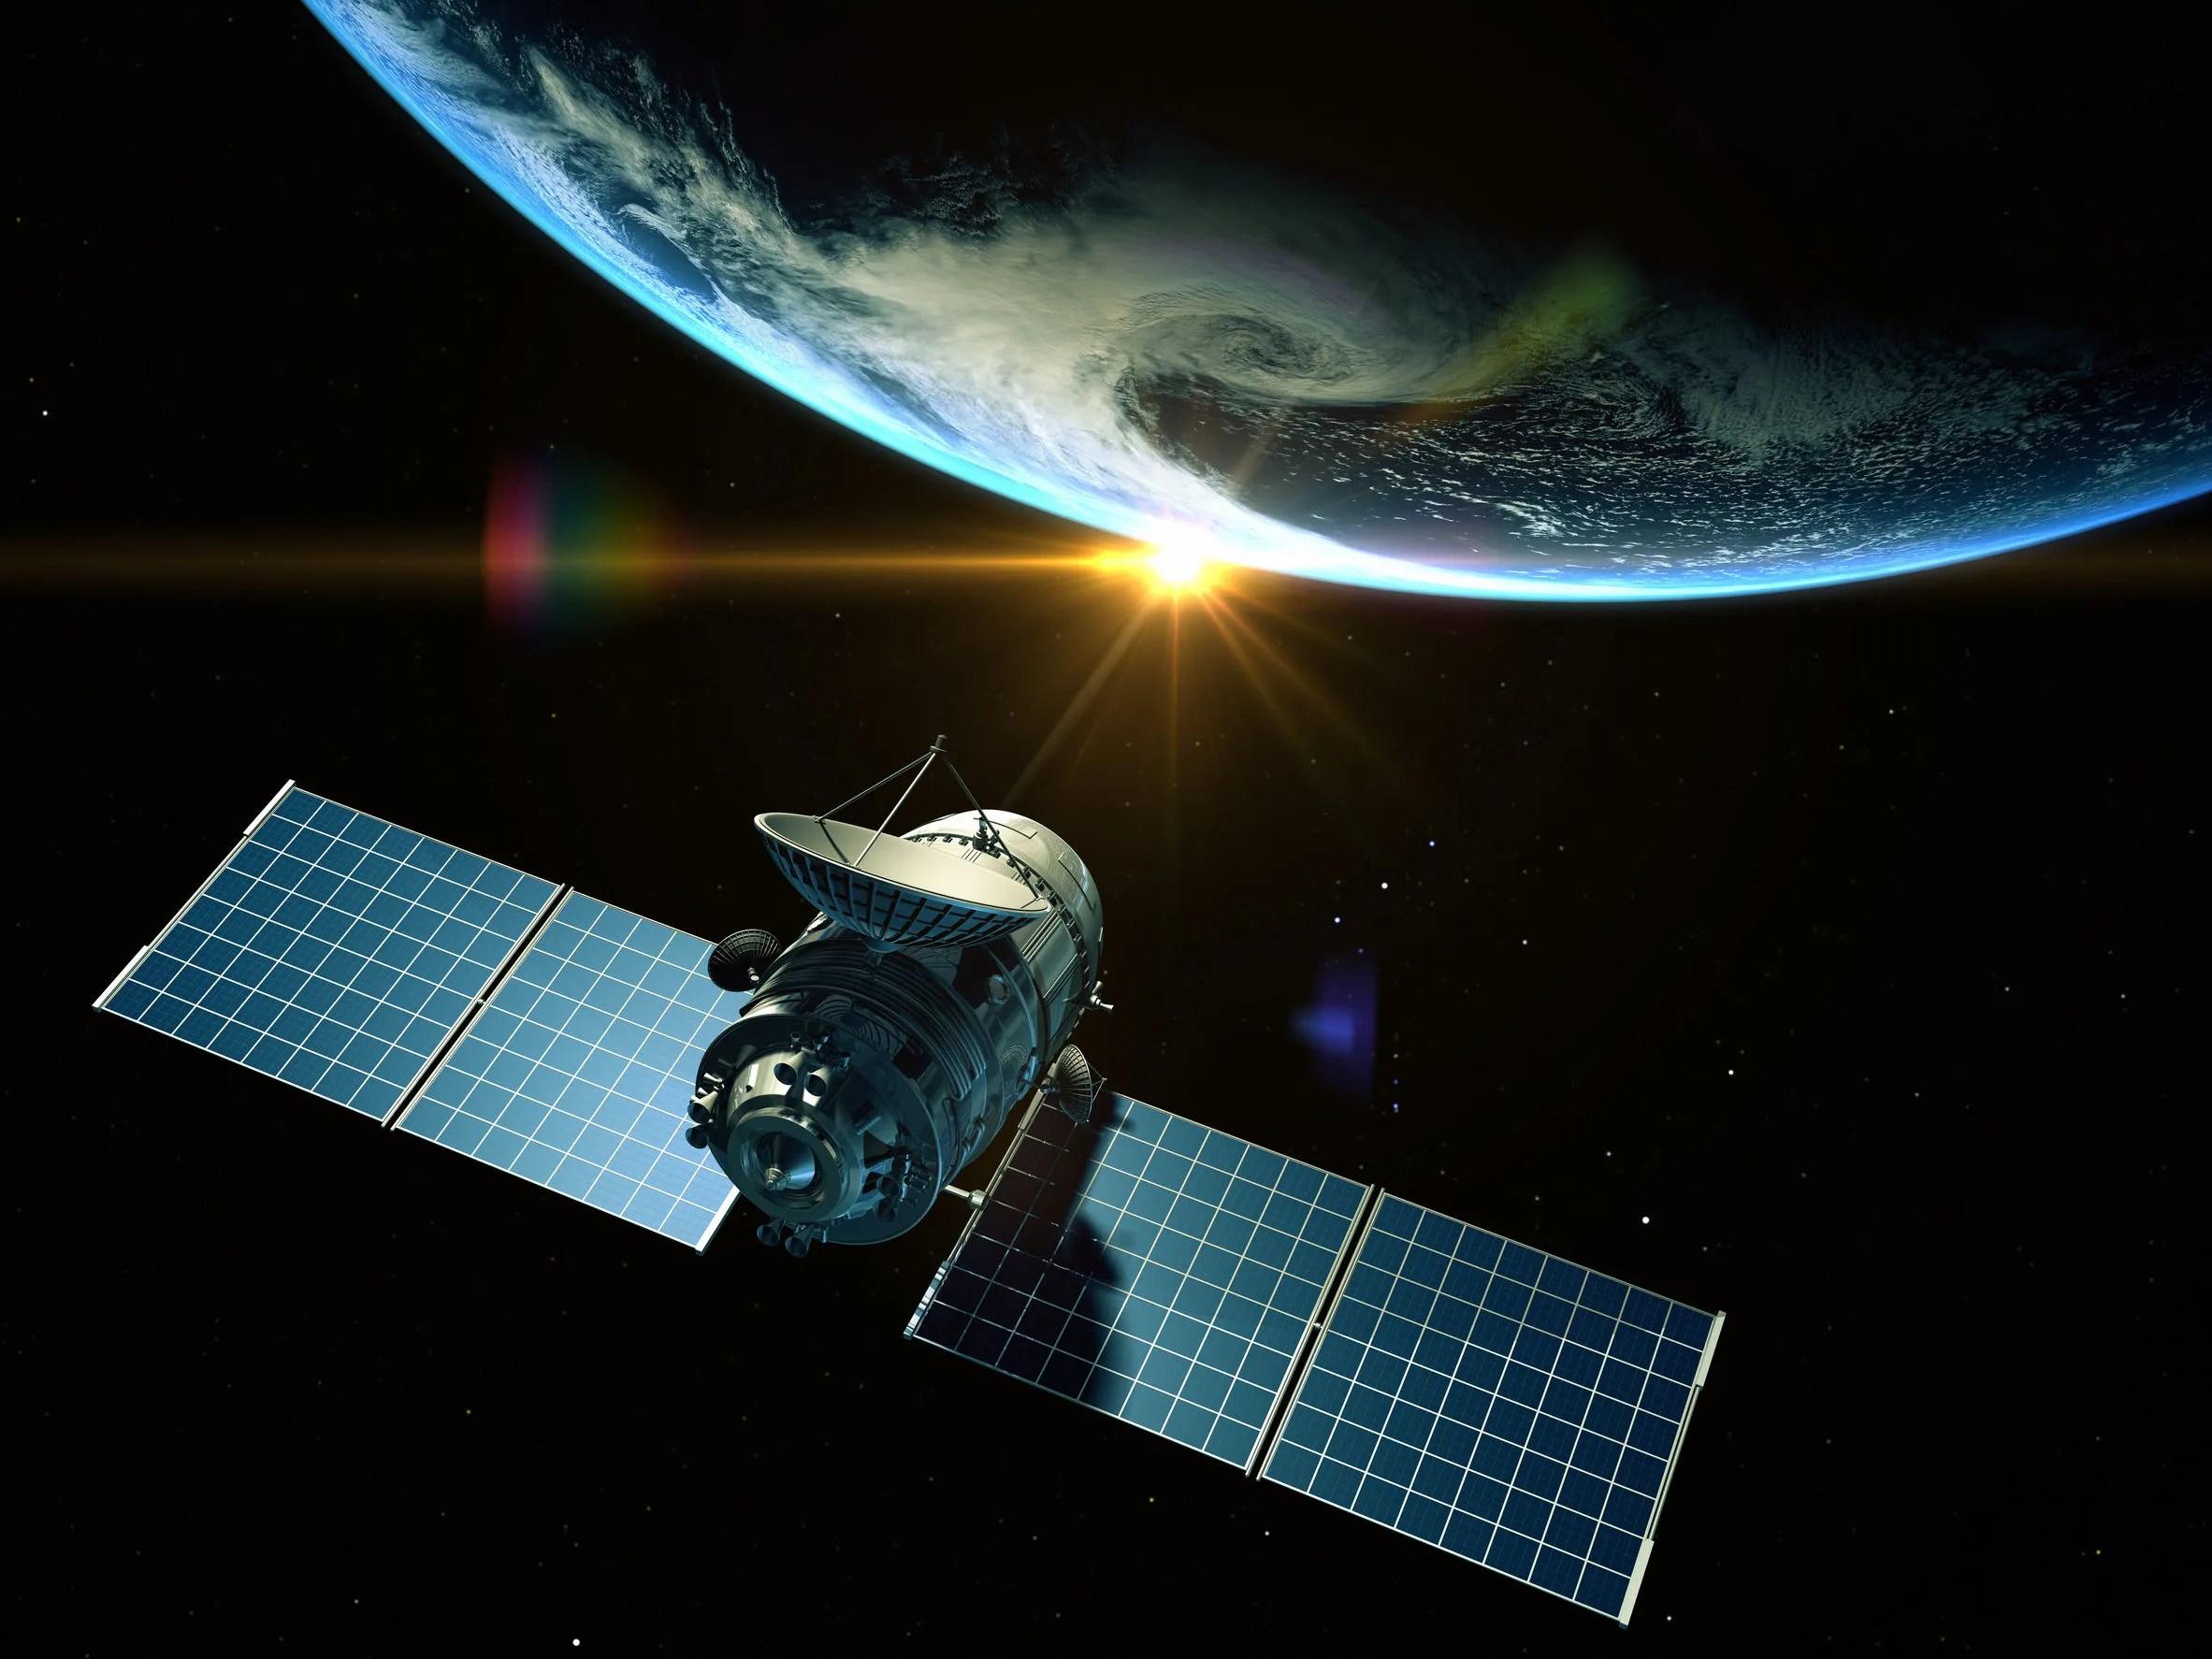 GPS satellite in space